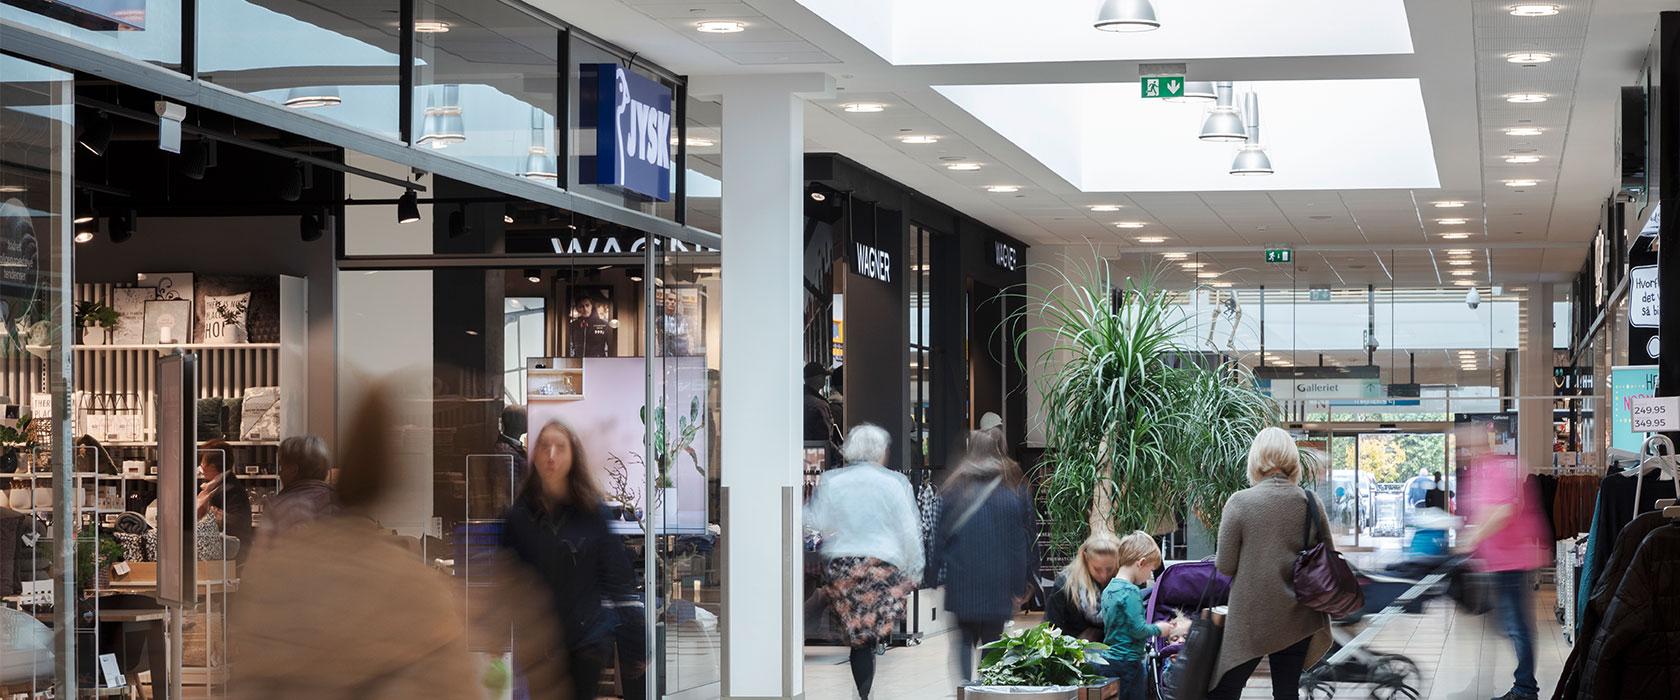 Rødovre Centrum handlende mennesker